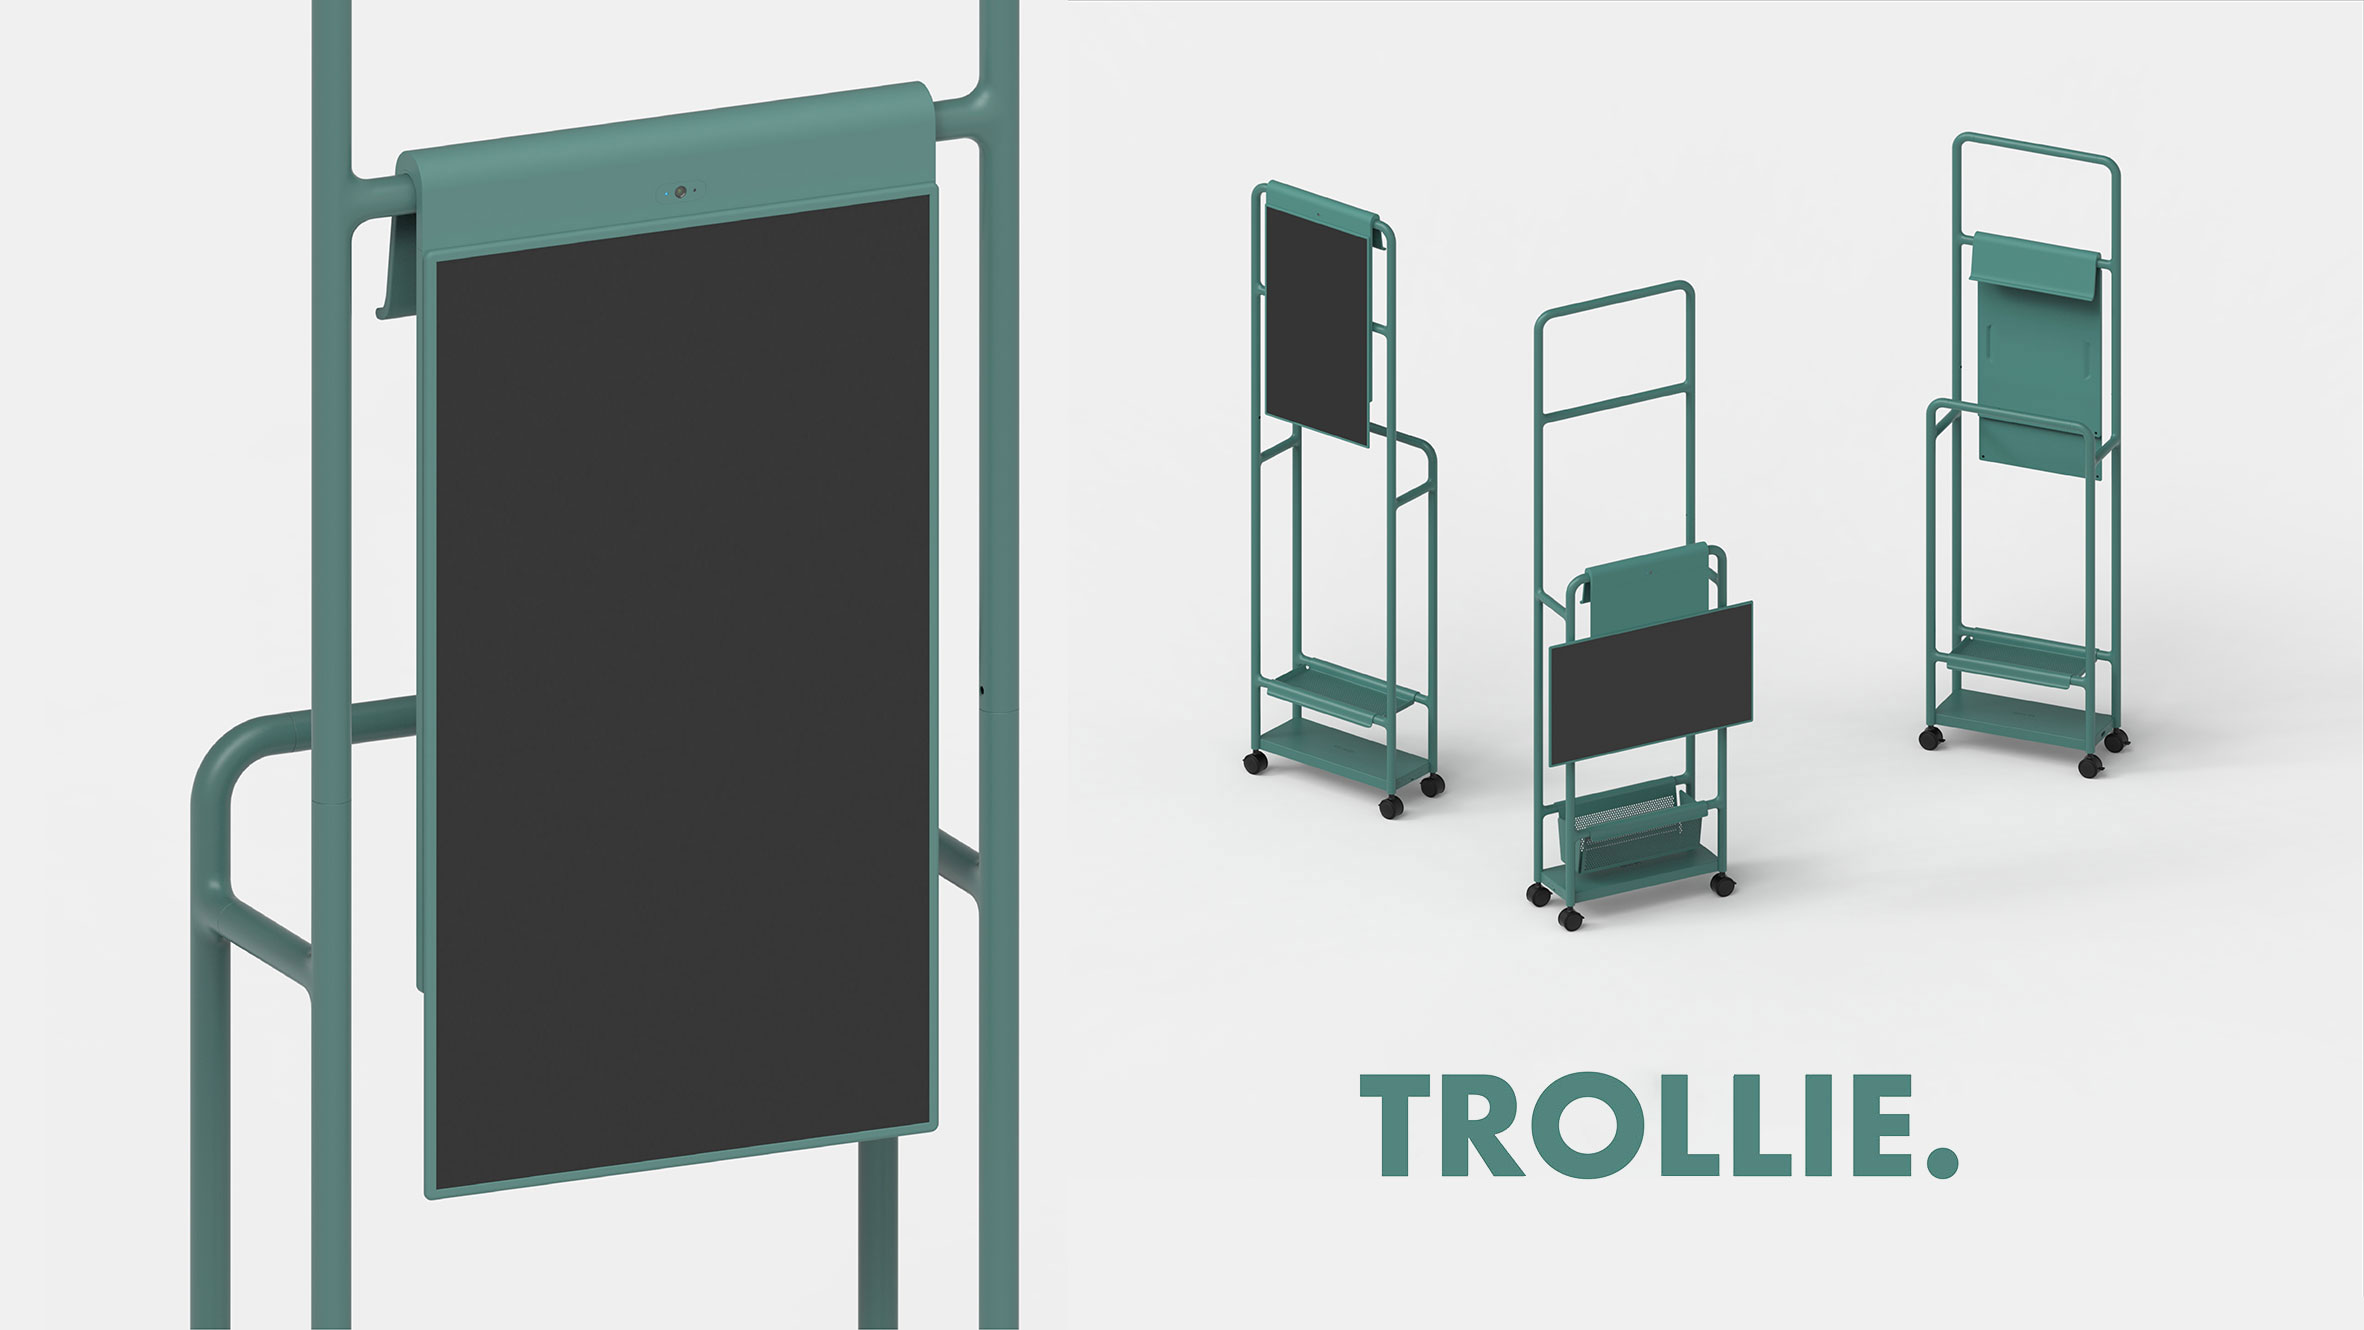 LG Trollie by YunChik Lee and Bomi Kim